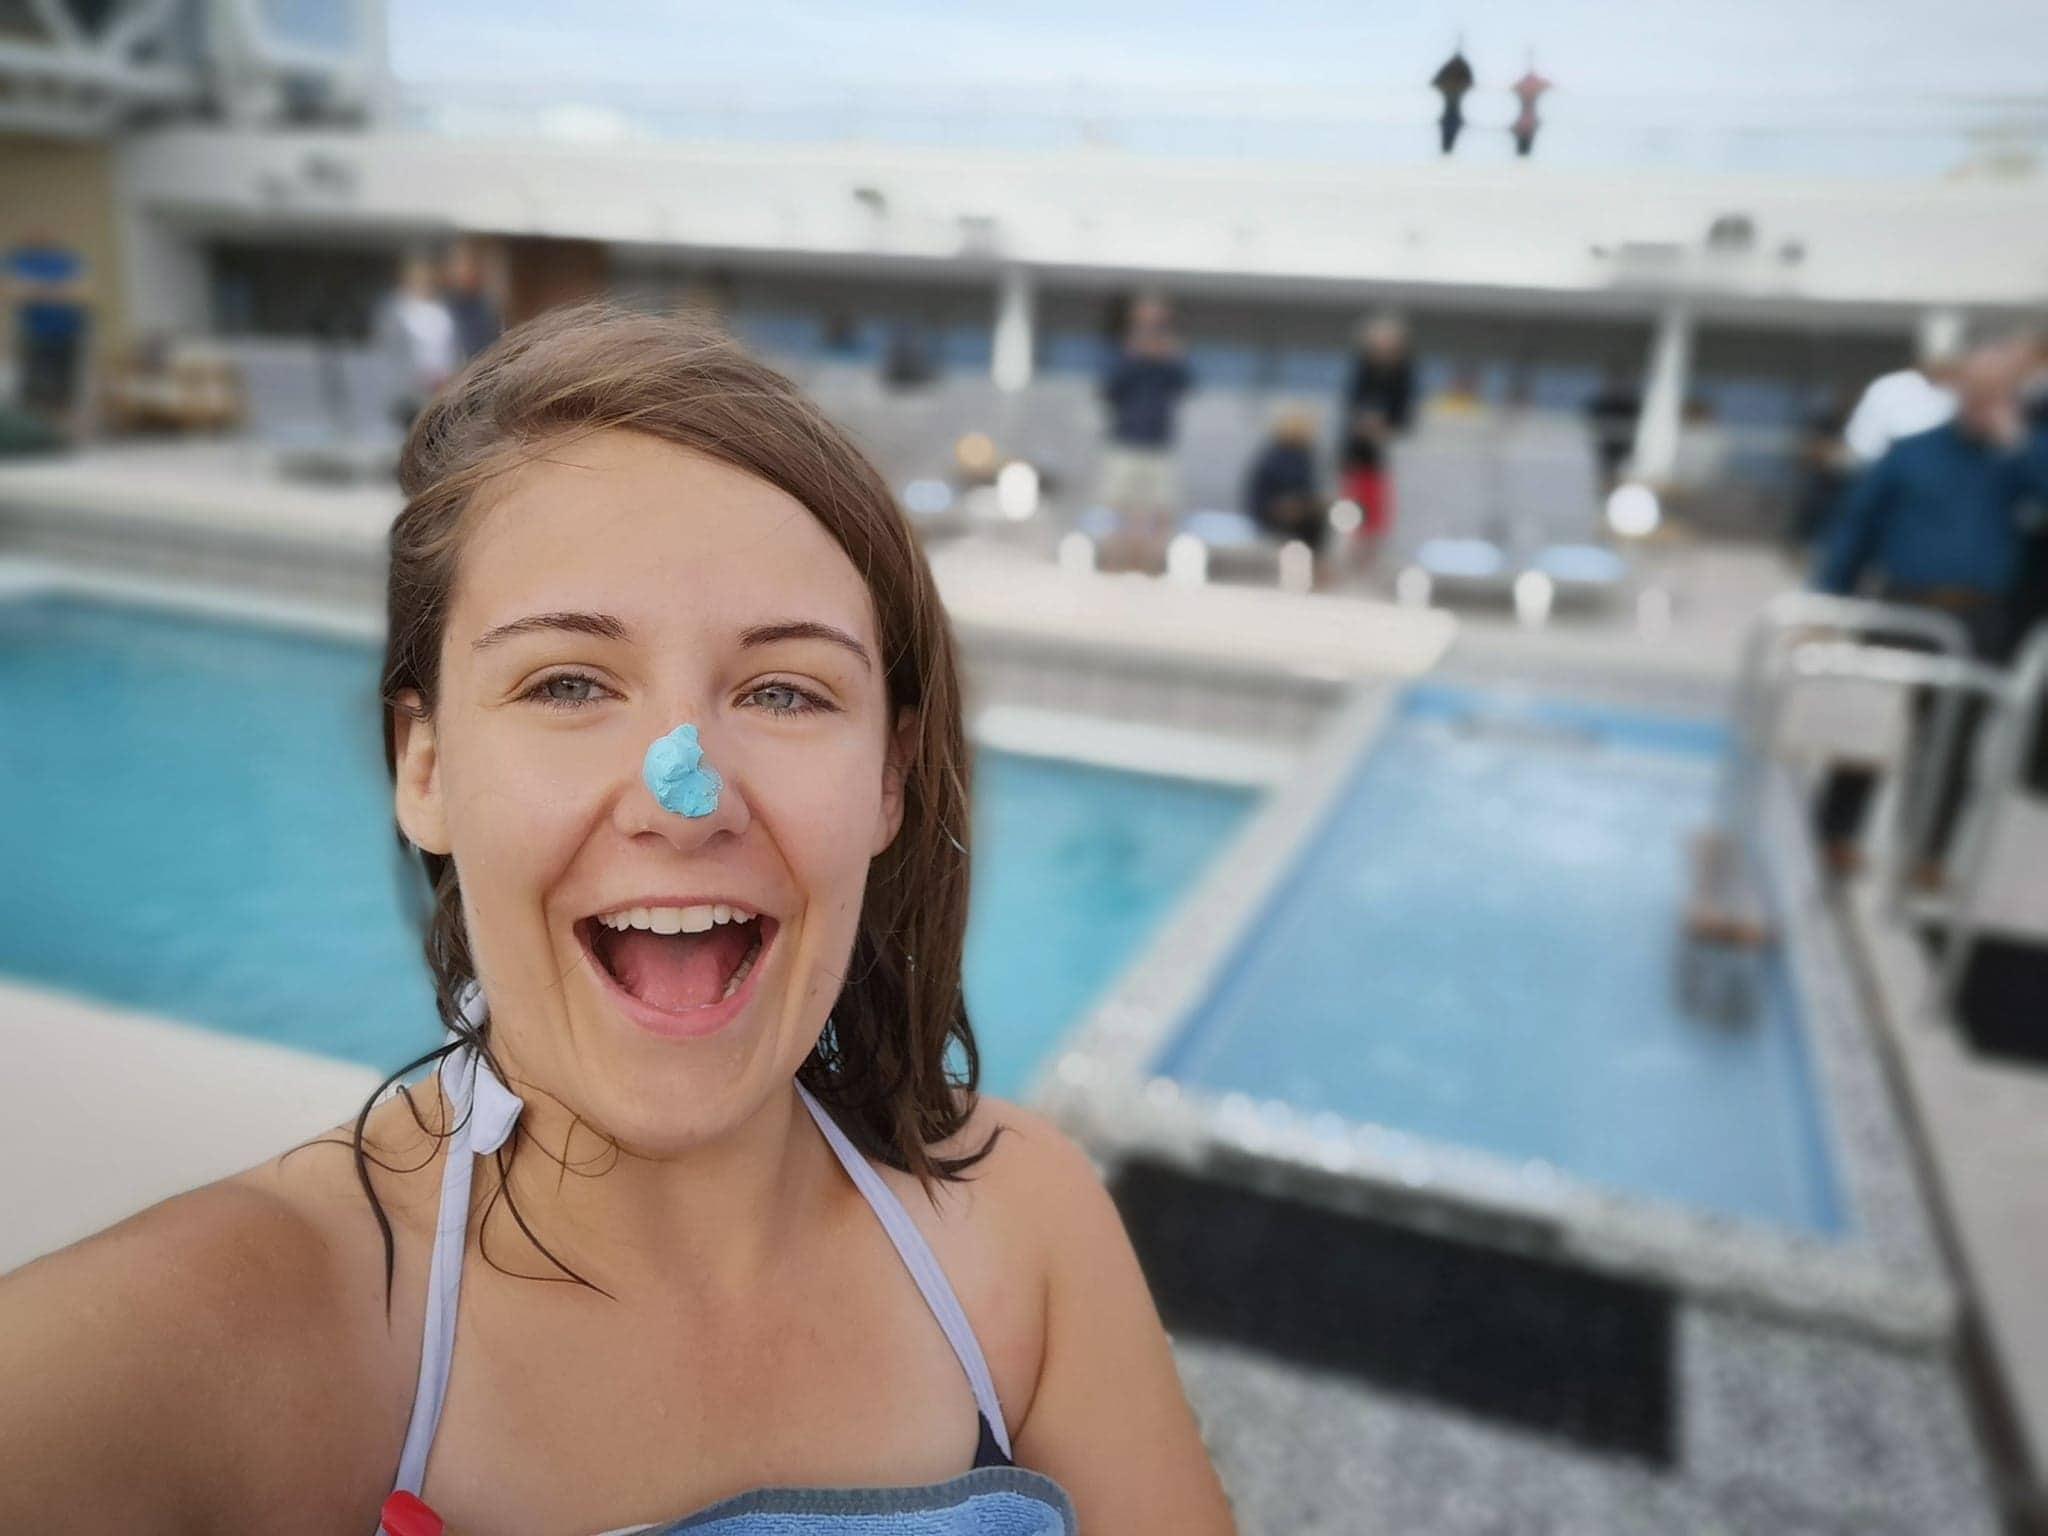 viking cruises blue nose ceremony bluenose ice pool swimming blue cream arctic circle blue cream on nose